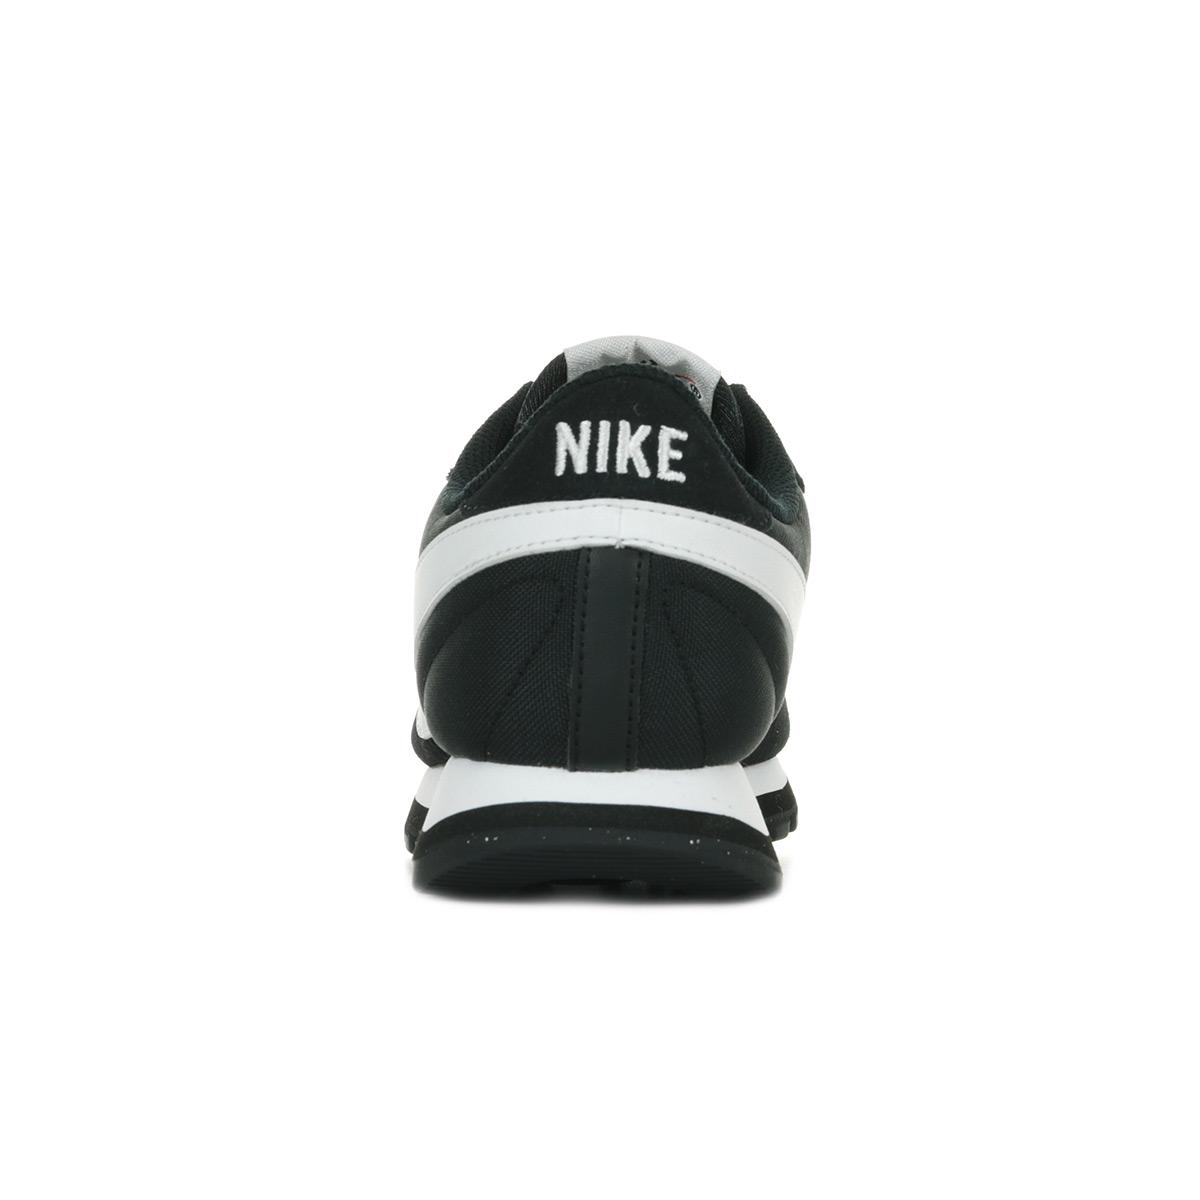 Ao3166002 O Pre Femme W x Baskets Love Mode Nike A6XqwaO1R